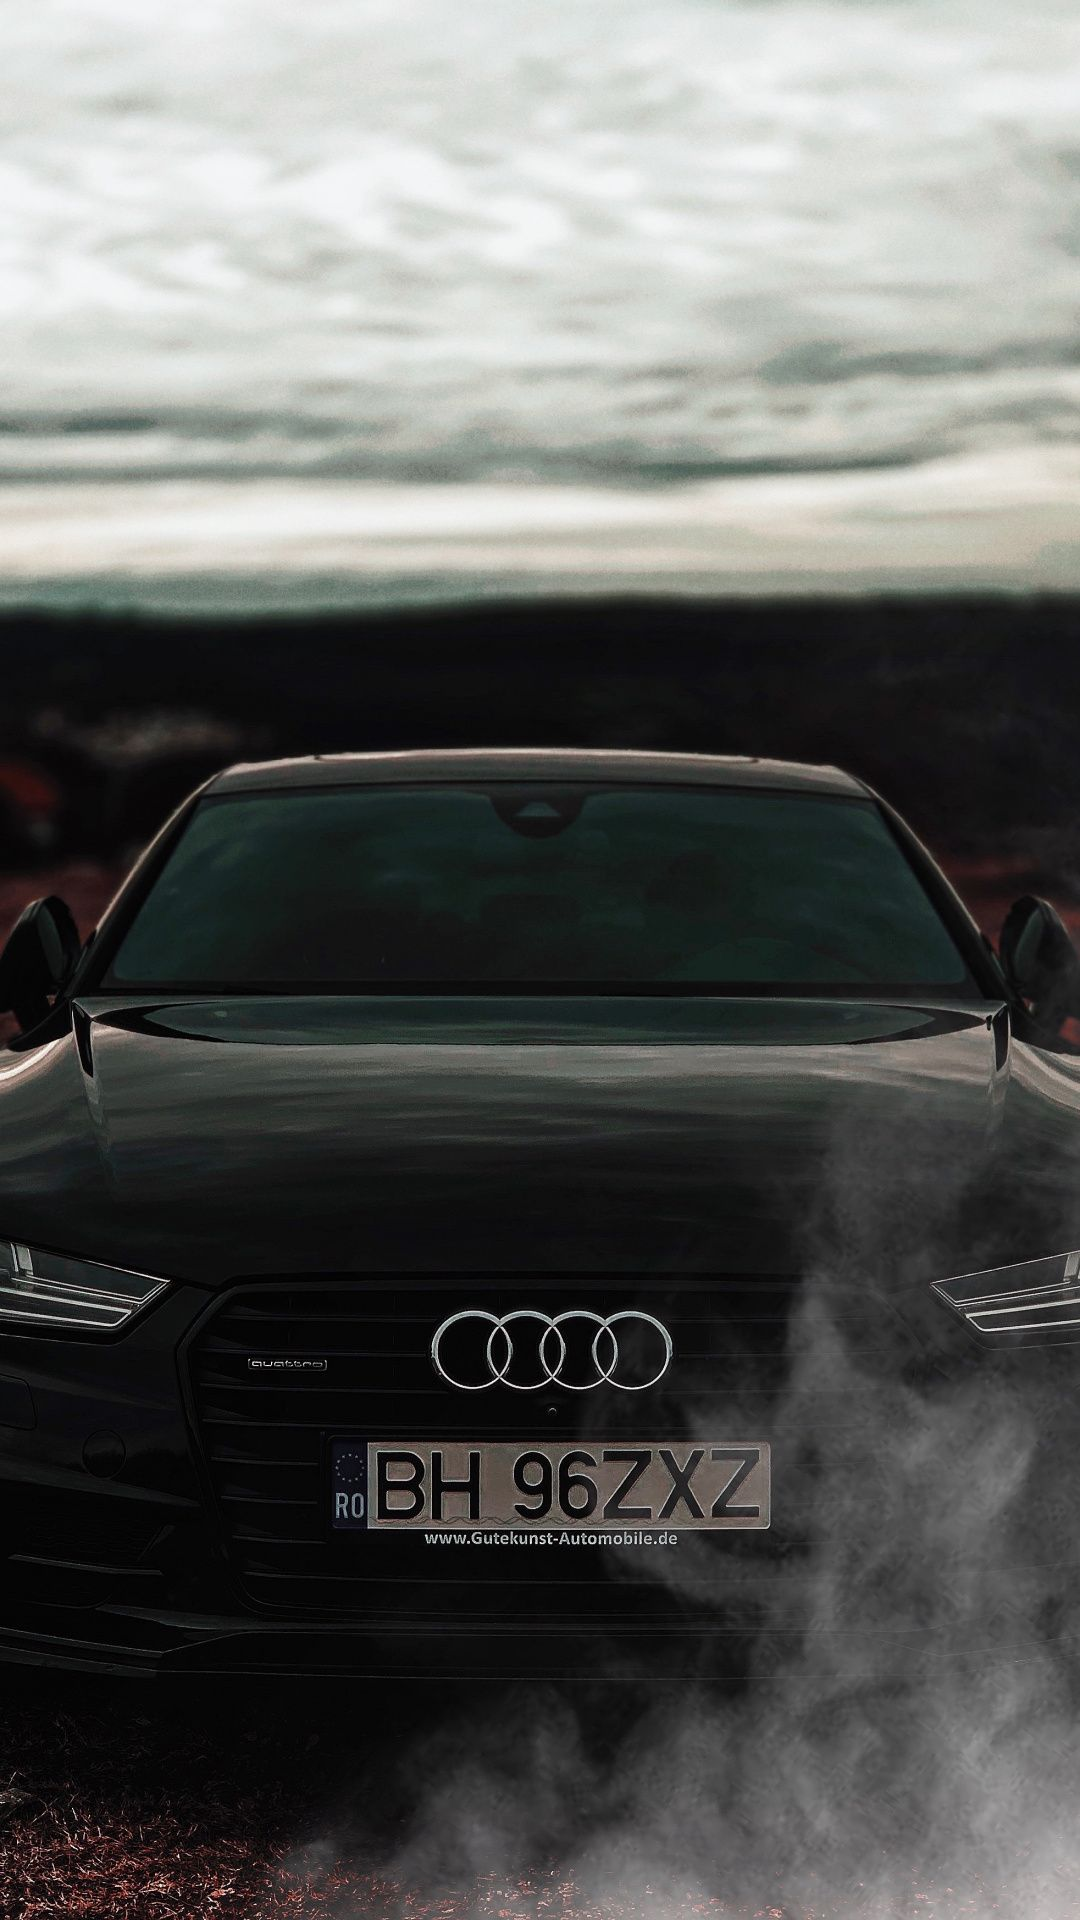 Wallpapers Audi Rs7 Audi A7 Audi Q5 Audi S8 Audi A5 With